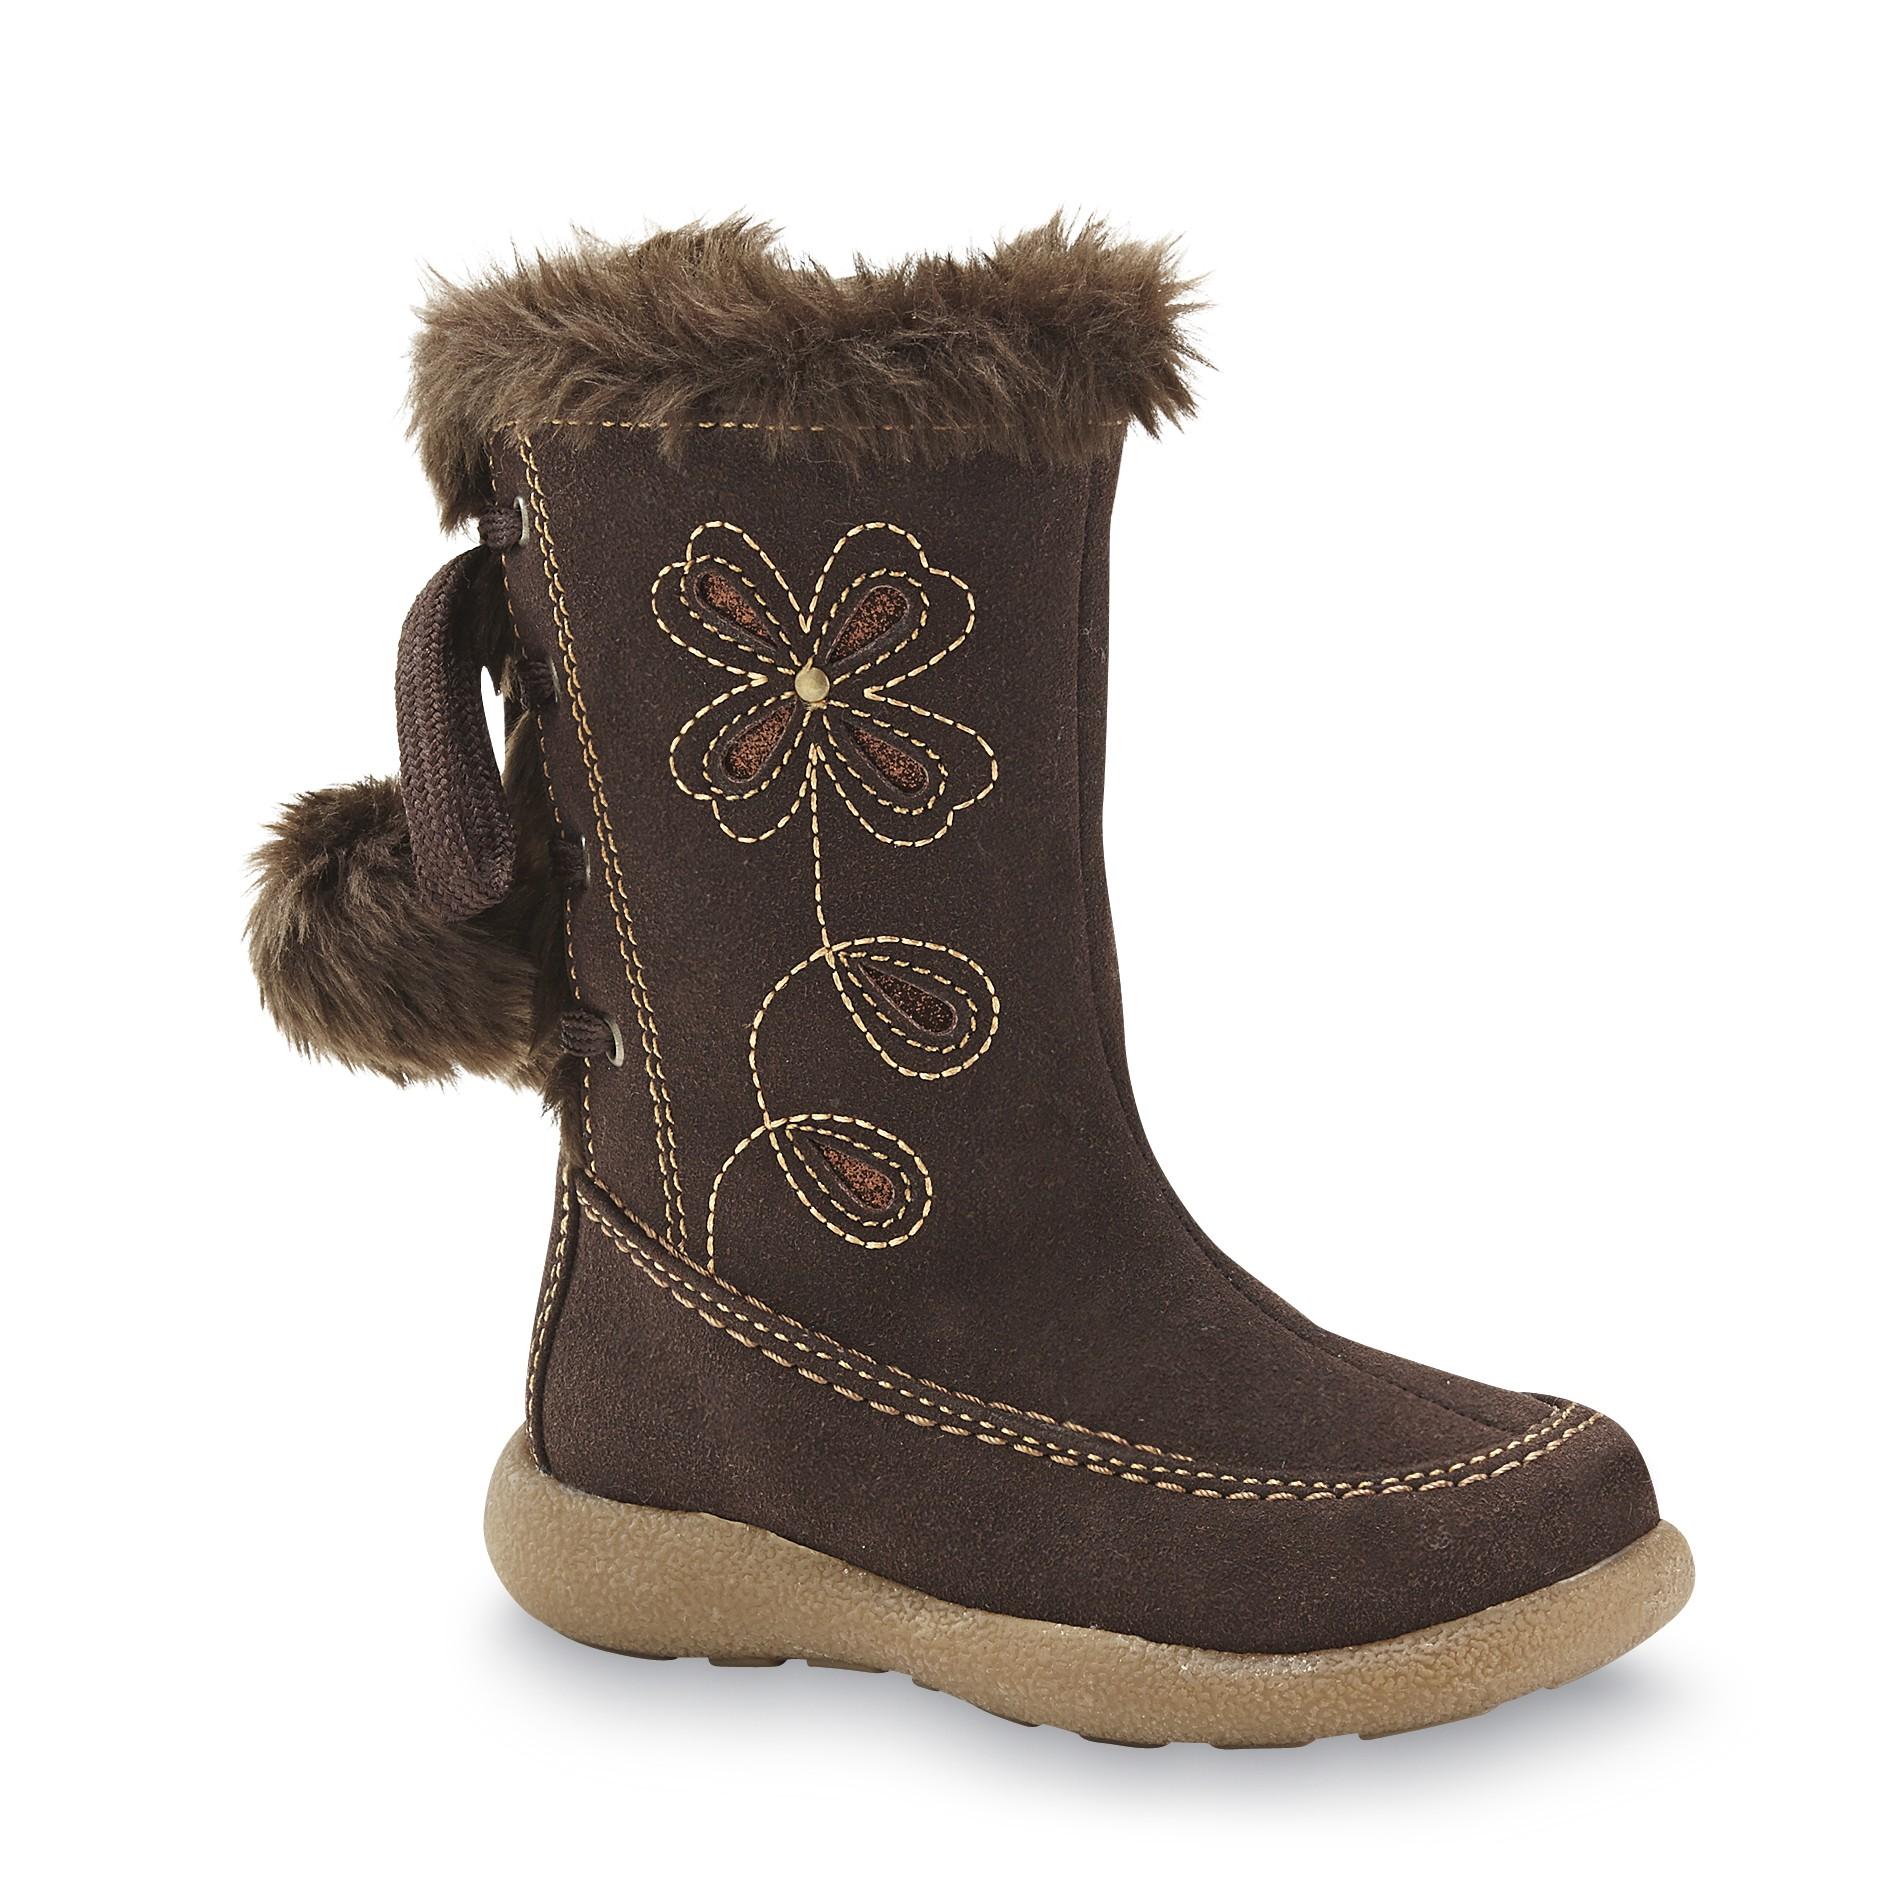 Rachel Shoes Toddler Girl's Sundance Brown Fashion Boot